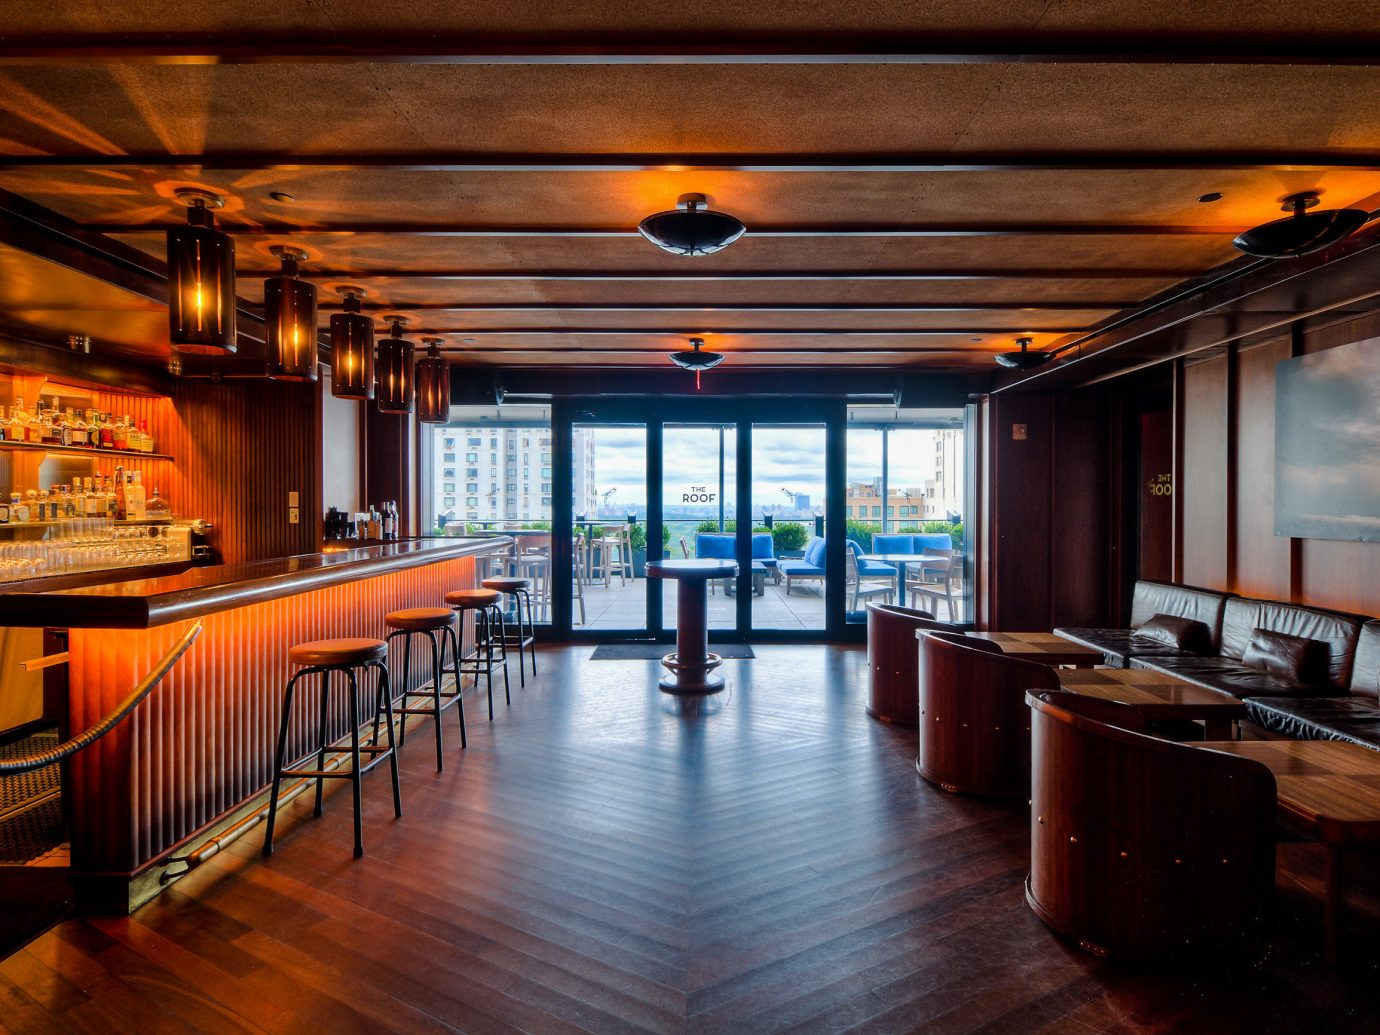 Boutique Hotels Food + Drink Hotels floor indoor ceiling table room restaurant interior design wood Bar wooden real estate Dining long furniture empty area several